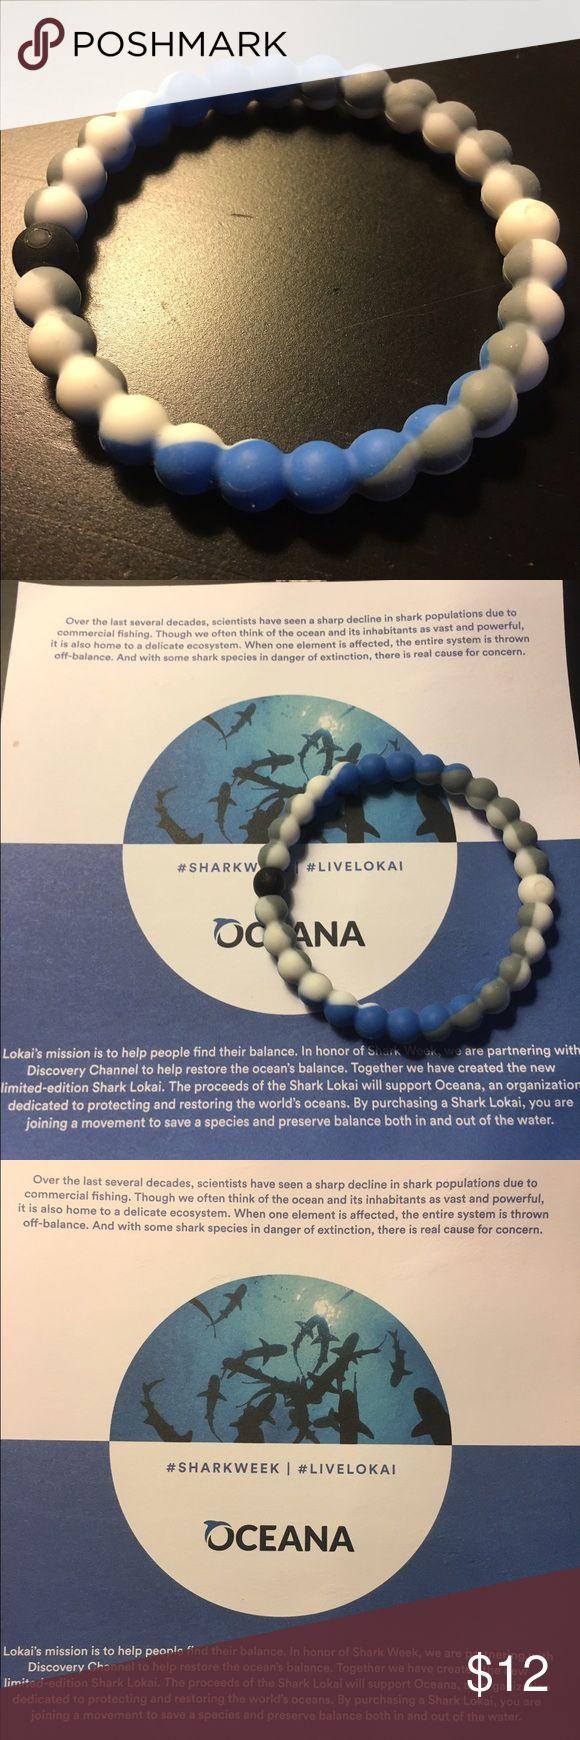 Oceana Shark week Lokai bracelet. Medium. Oceana Shark week Lokai bracelet. Medium. Bought it for my husband, it's too small. Lokai Jewelry Bracelets